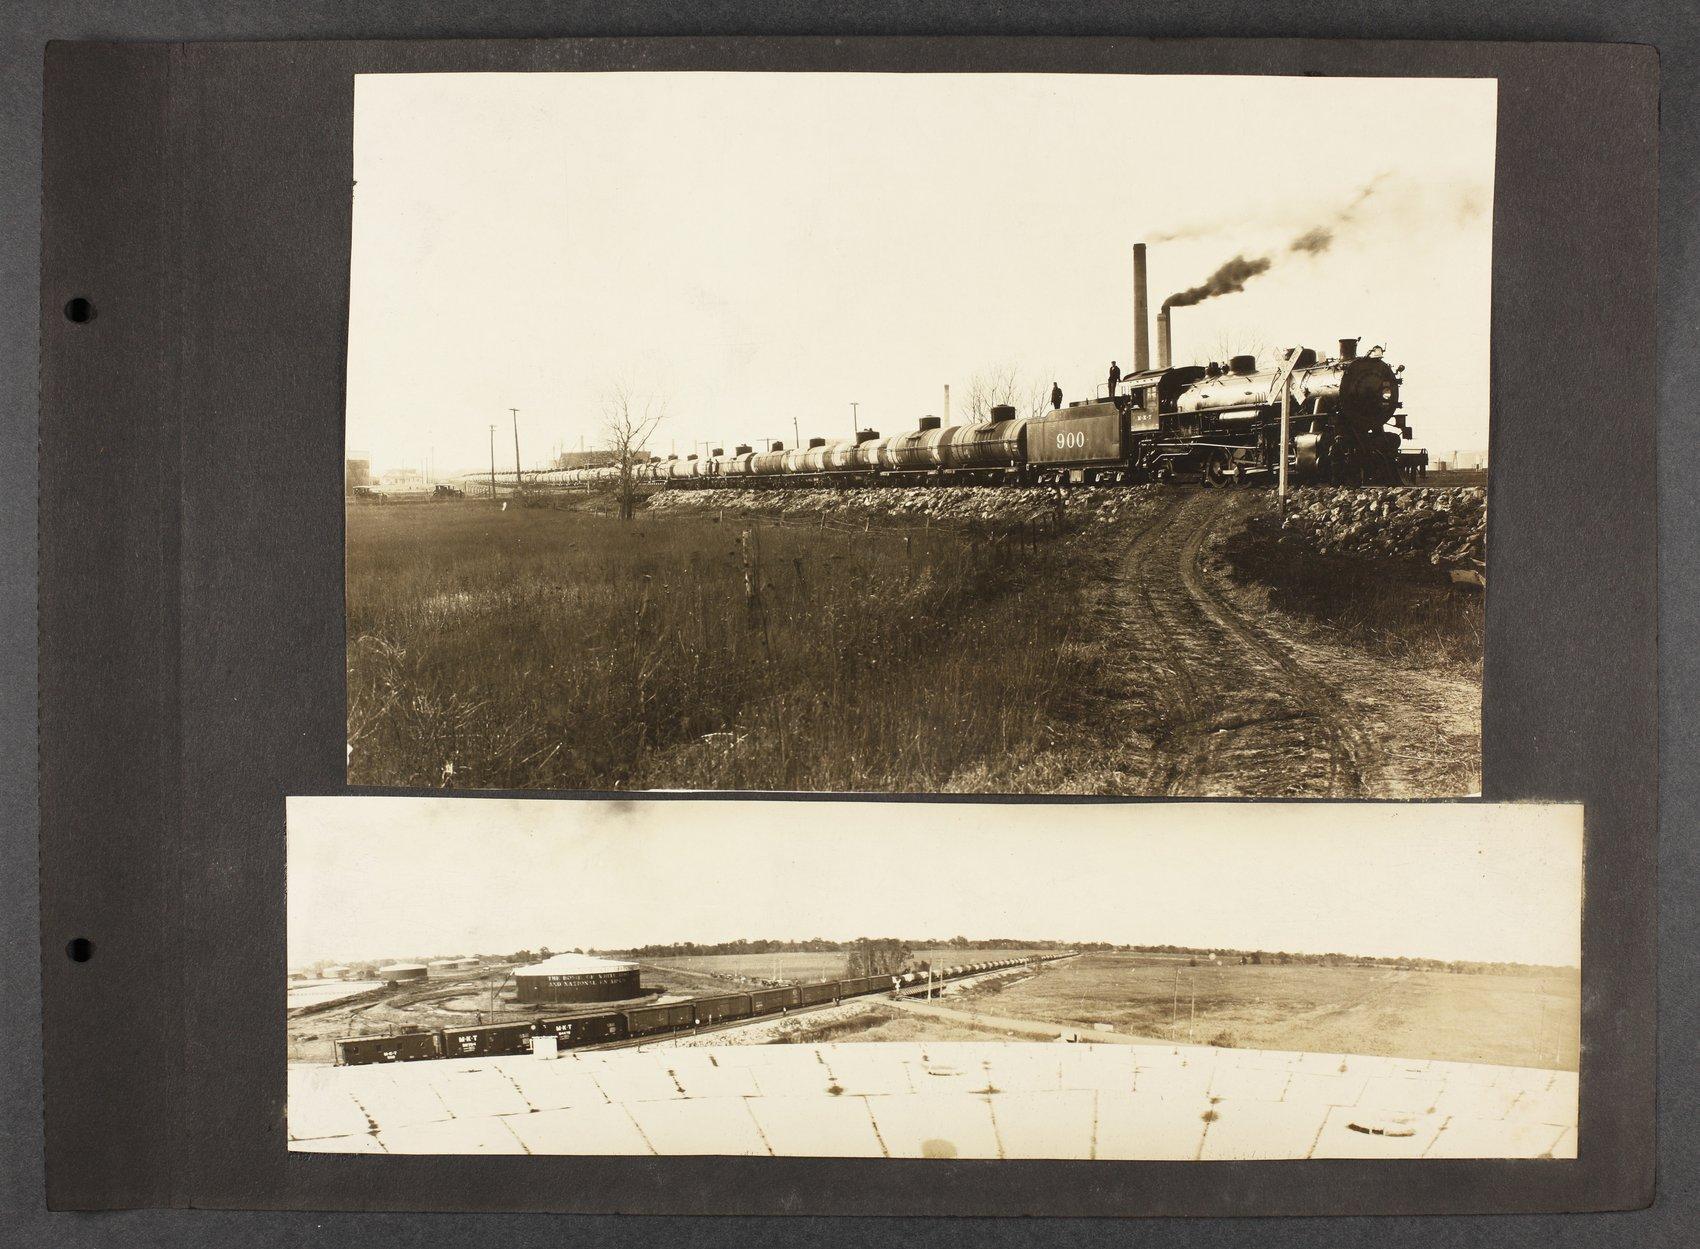 National Refining Company, Coffeyville, Kansas - 5